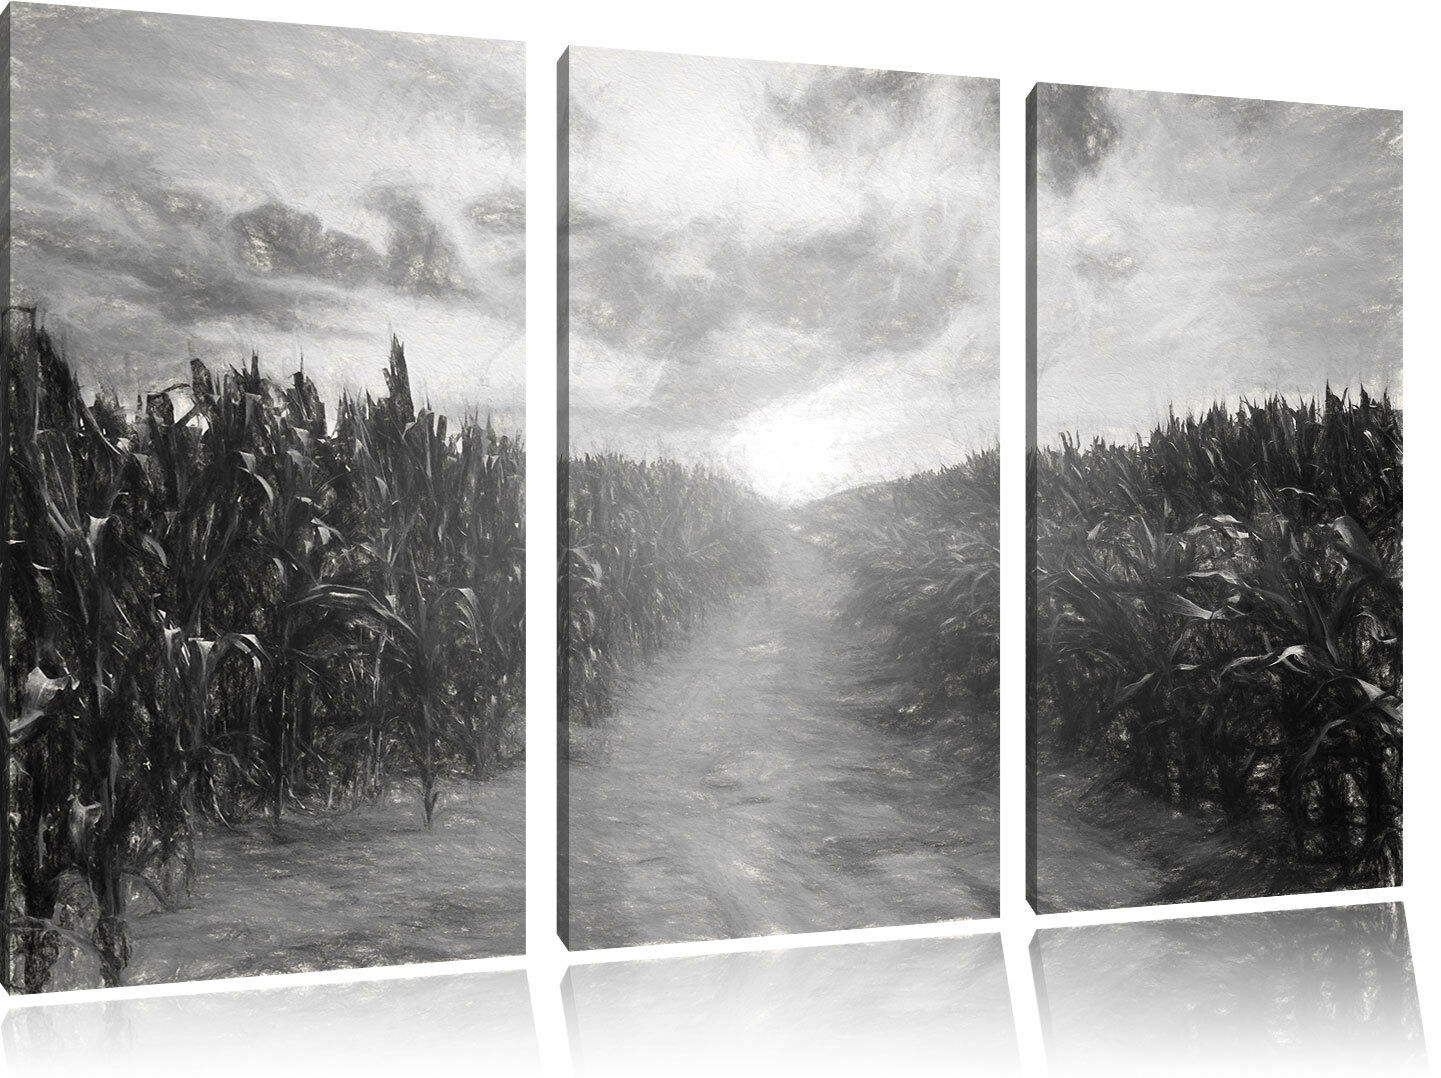 Pfad durch sonniges Feld Kunst Kohle Effekt 3-Teiler Leinwandbild Wanddeko Kunst